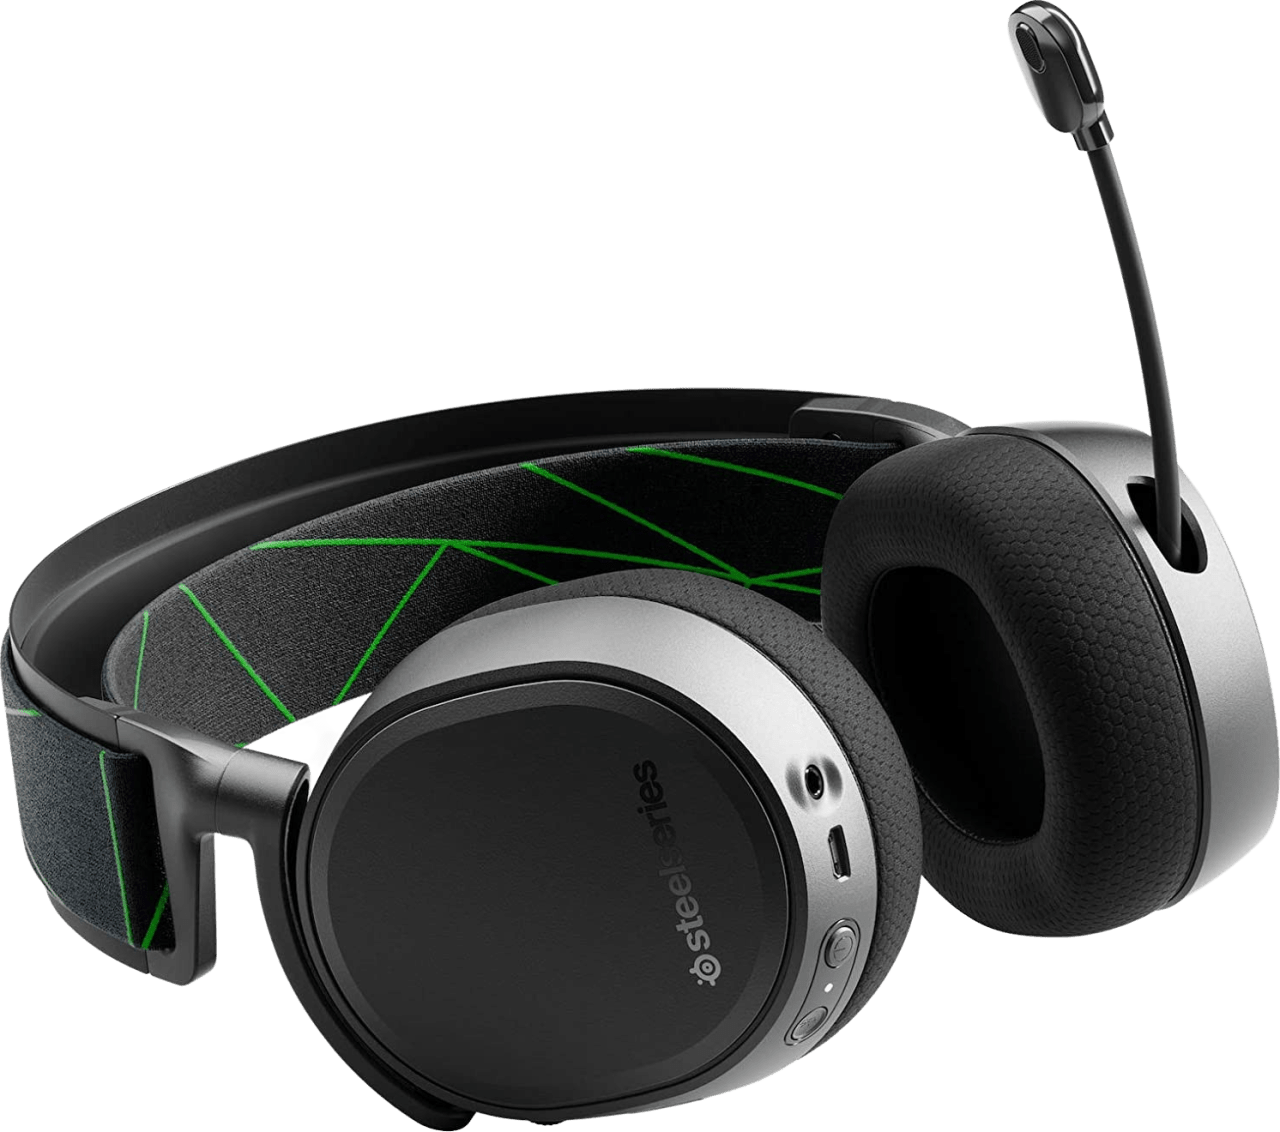 Schwarz Steelseries Arctis 9X Over-Ear-Gaming-Kopfhörer.2